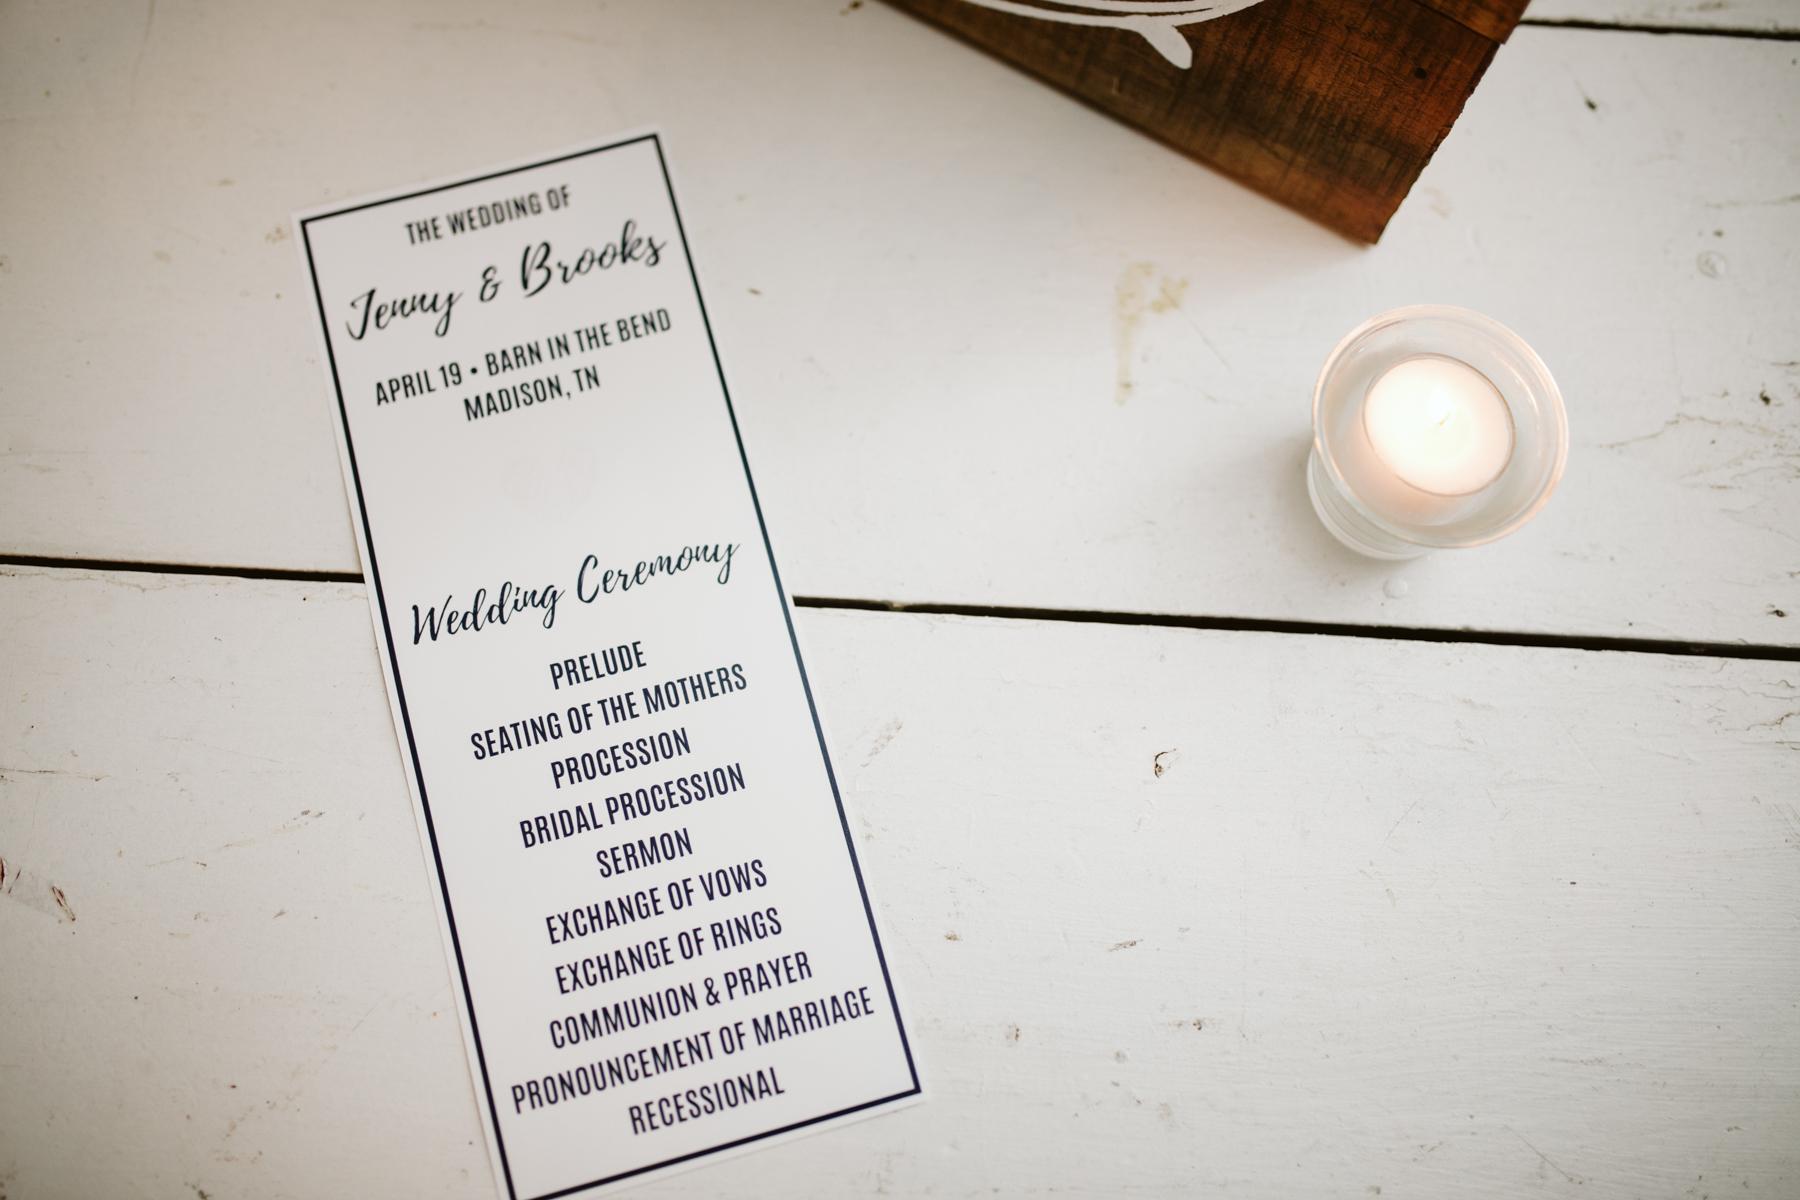 barn-in-the-bend-wedding (30).jpg